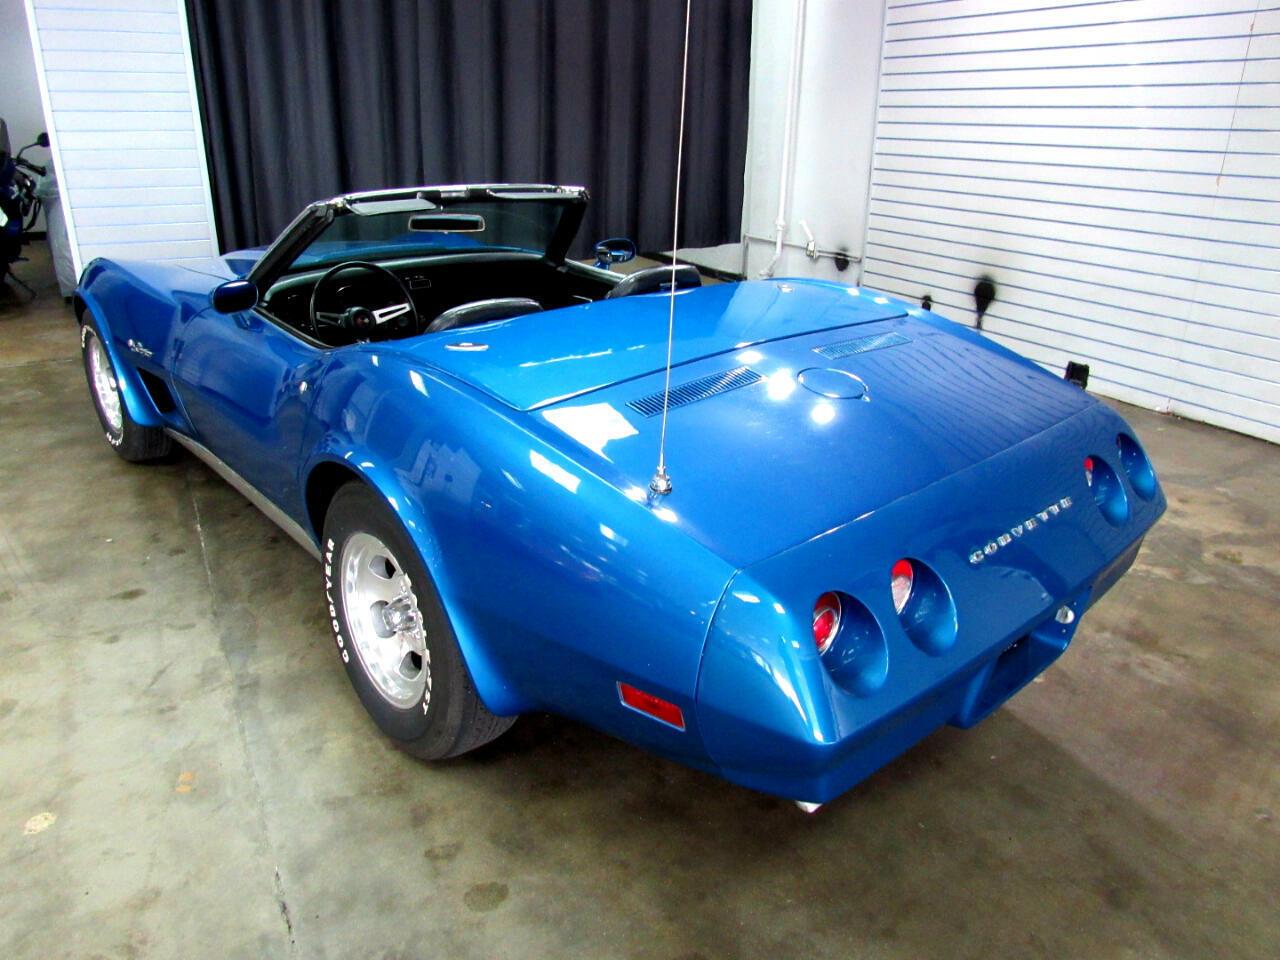 1974 Blue Chevrolet Corvette Convertible  | C3 Corvette Photo 5